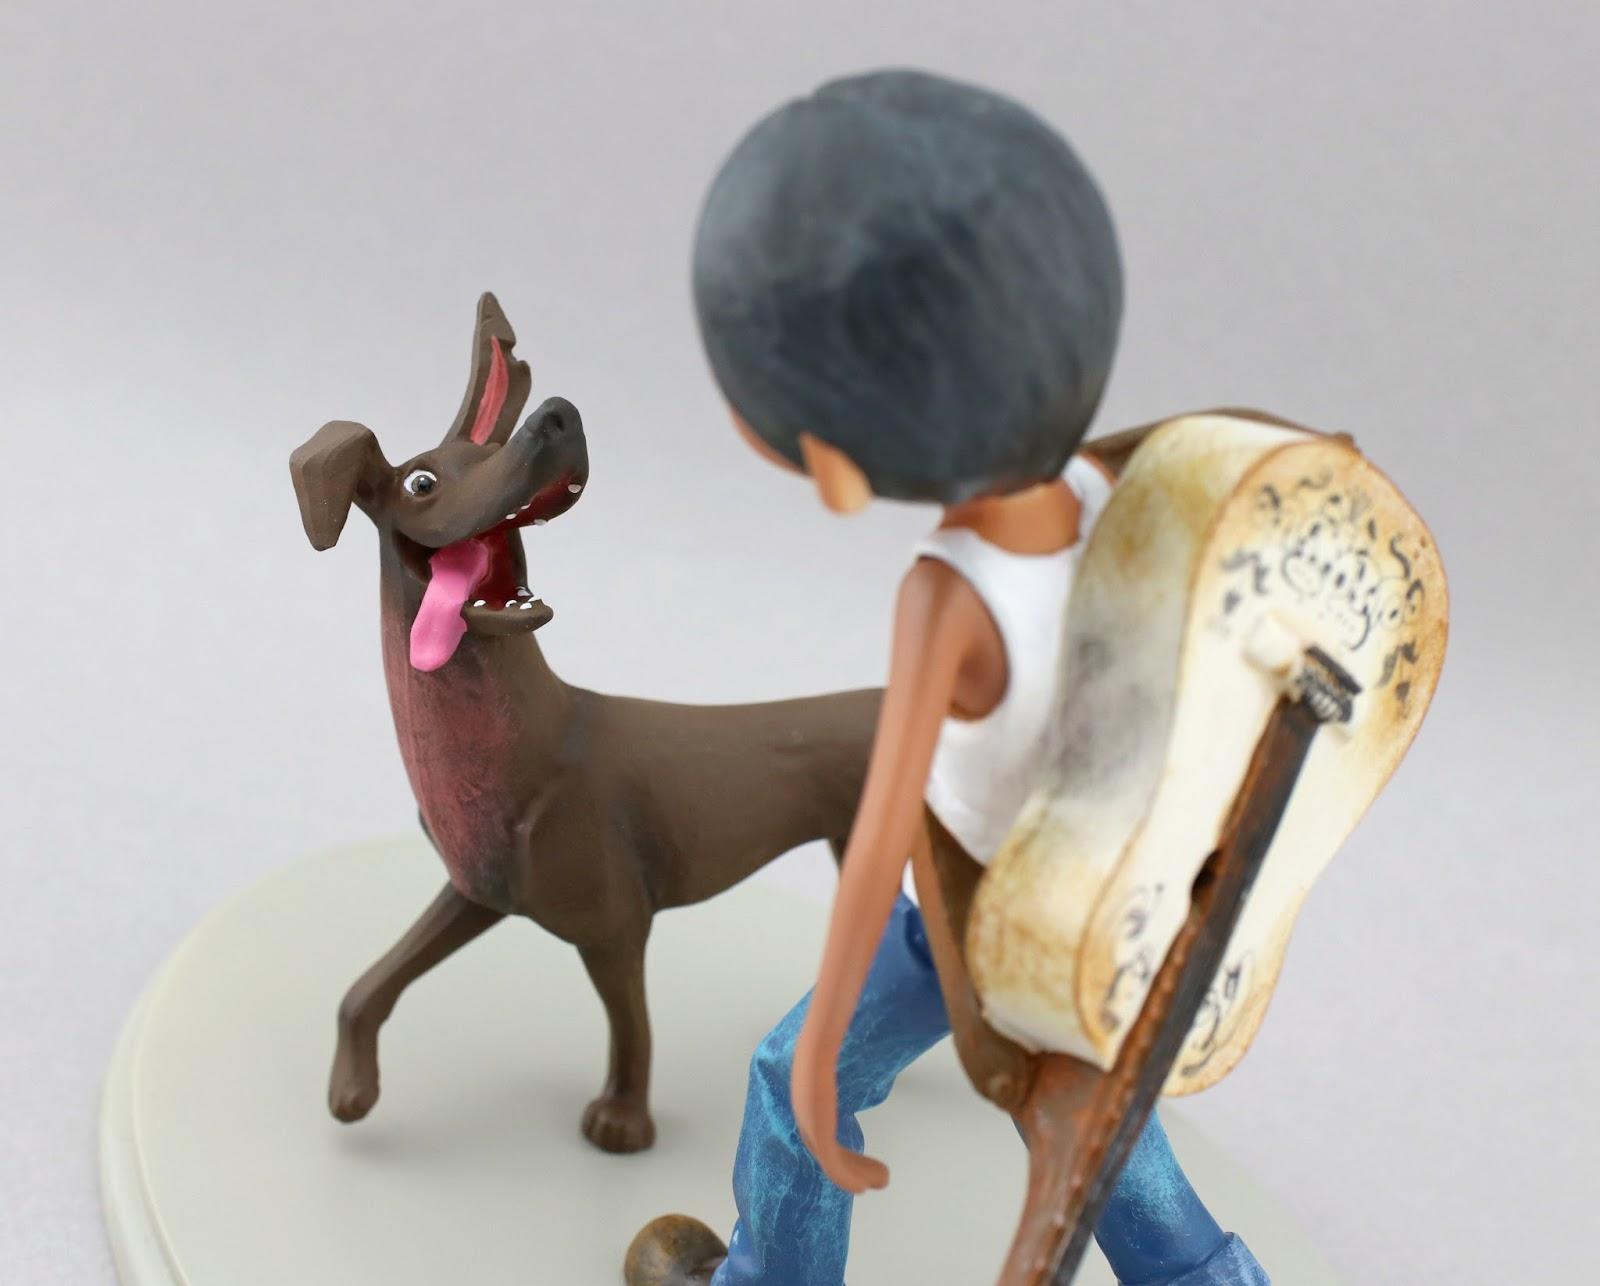 coco miguel and dante statue figure enesco